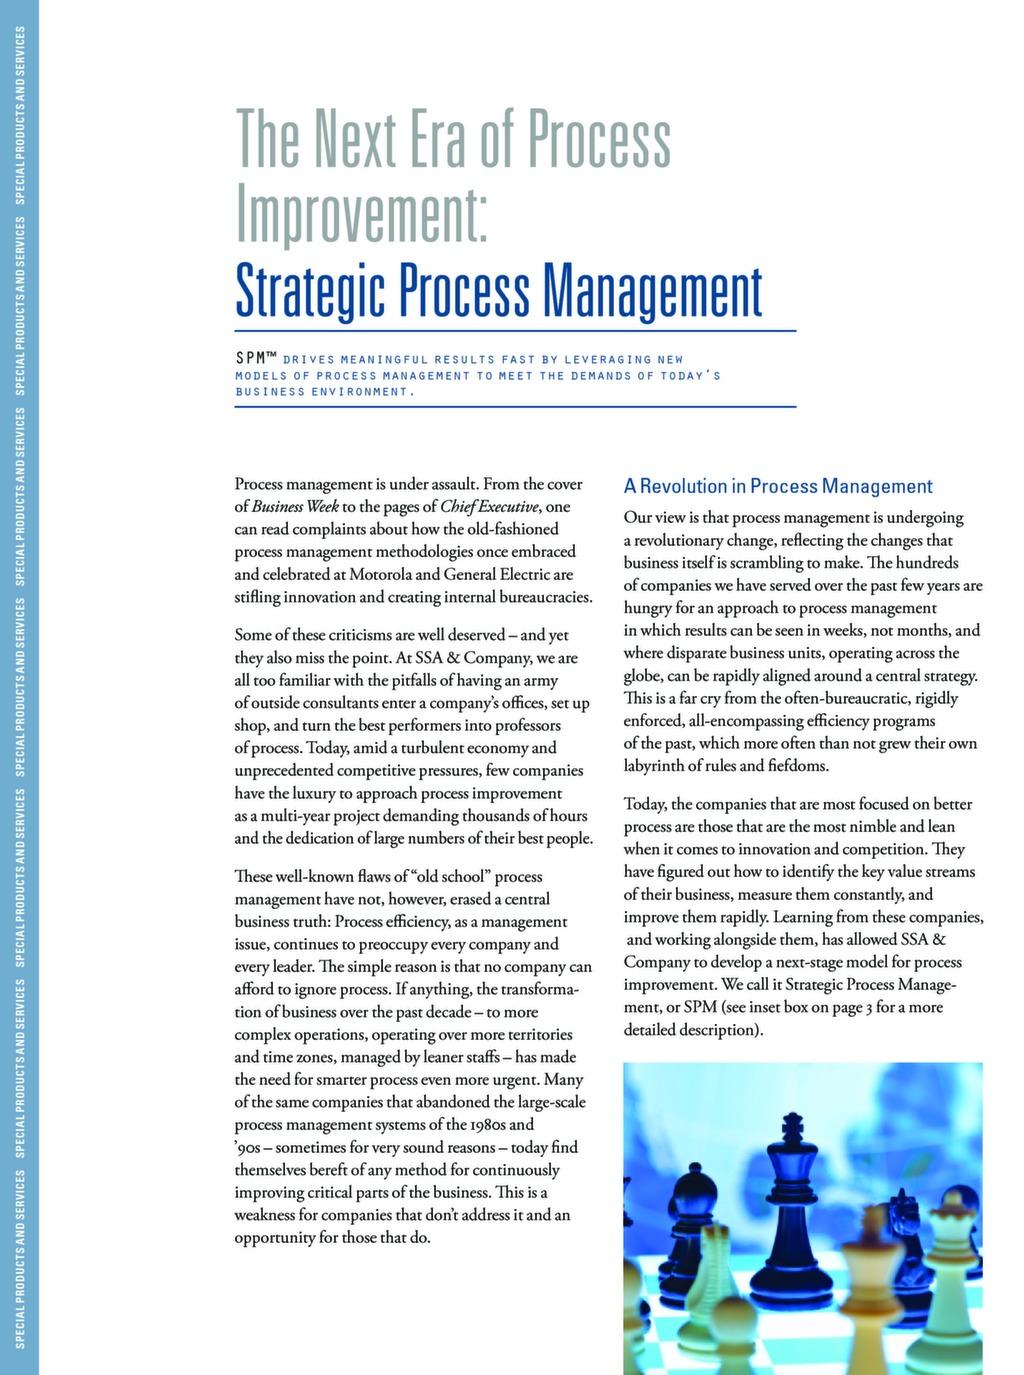 The Next Era of Process Improvement: Strategic Process